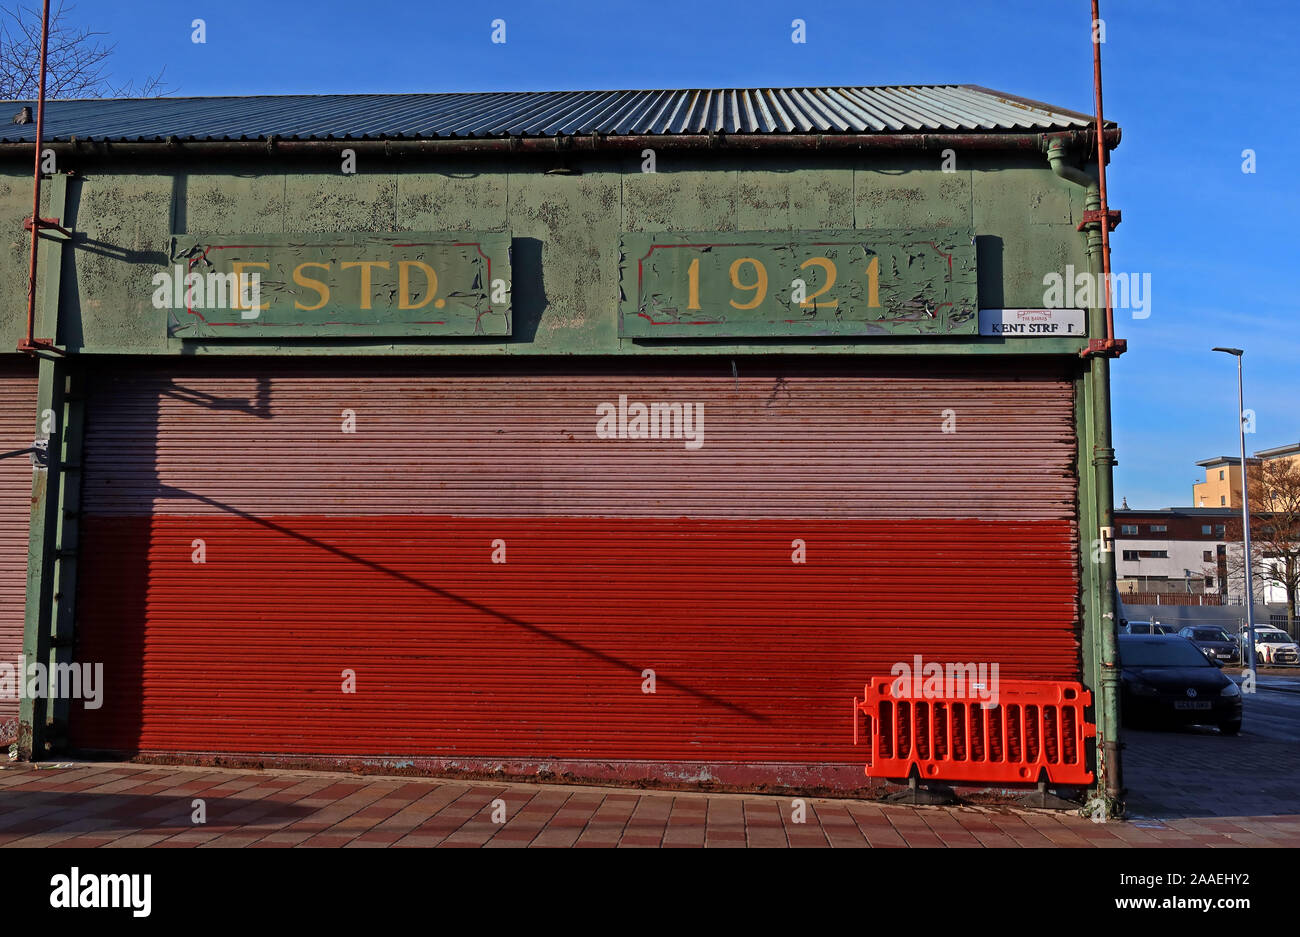 GotonySmith,UK,Scotland,Glasgow,city,city centre,HotpixUK,@HotpixUK,G1,seedy,notorious,signage,Glaswegian,green sign,The Barras,stall,green,covered markets,East End,G1 5DX,Calton,signs,Estd 1921,Established,1921,sign,Estd 1921 Barras sign,Estd 1921 sign